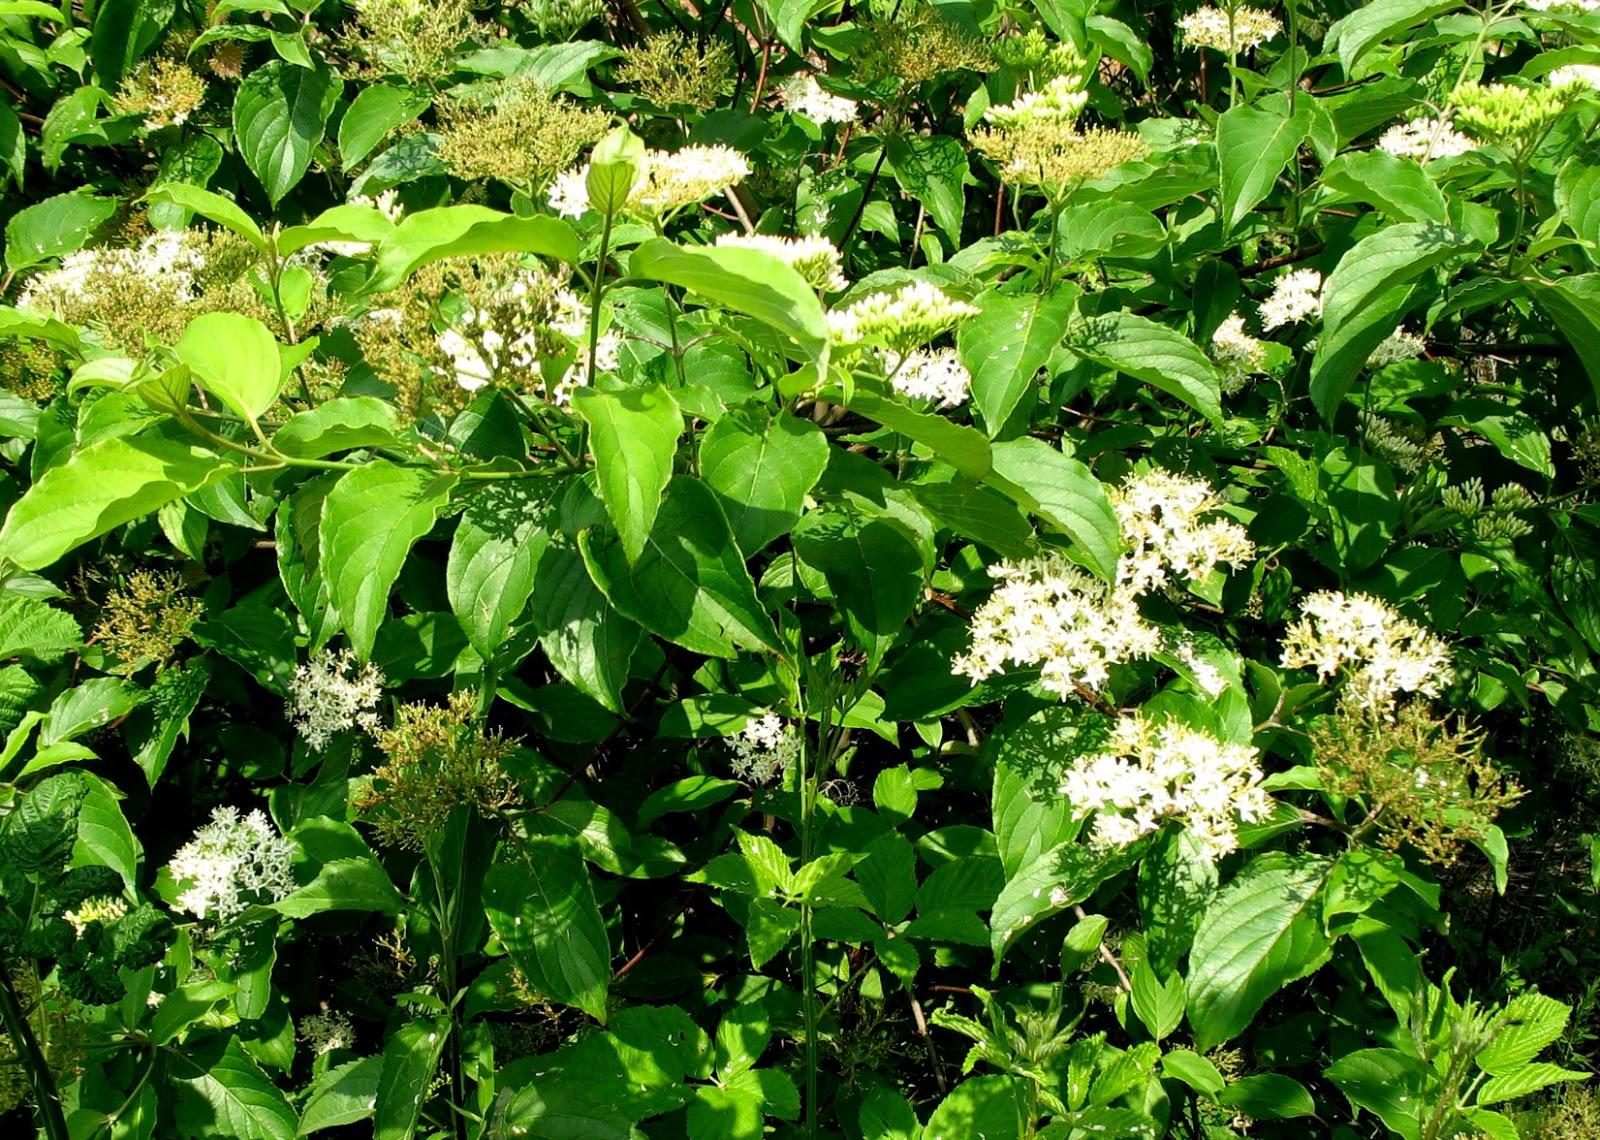 Using Georgia Native Plants Roadside White Shrubs